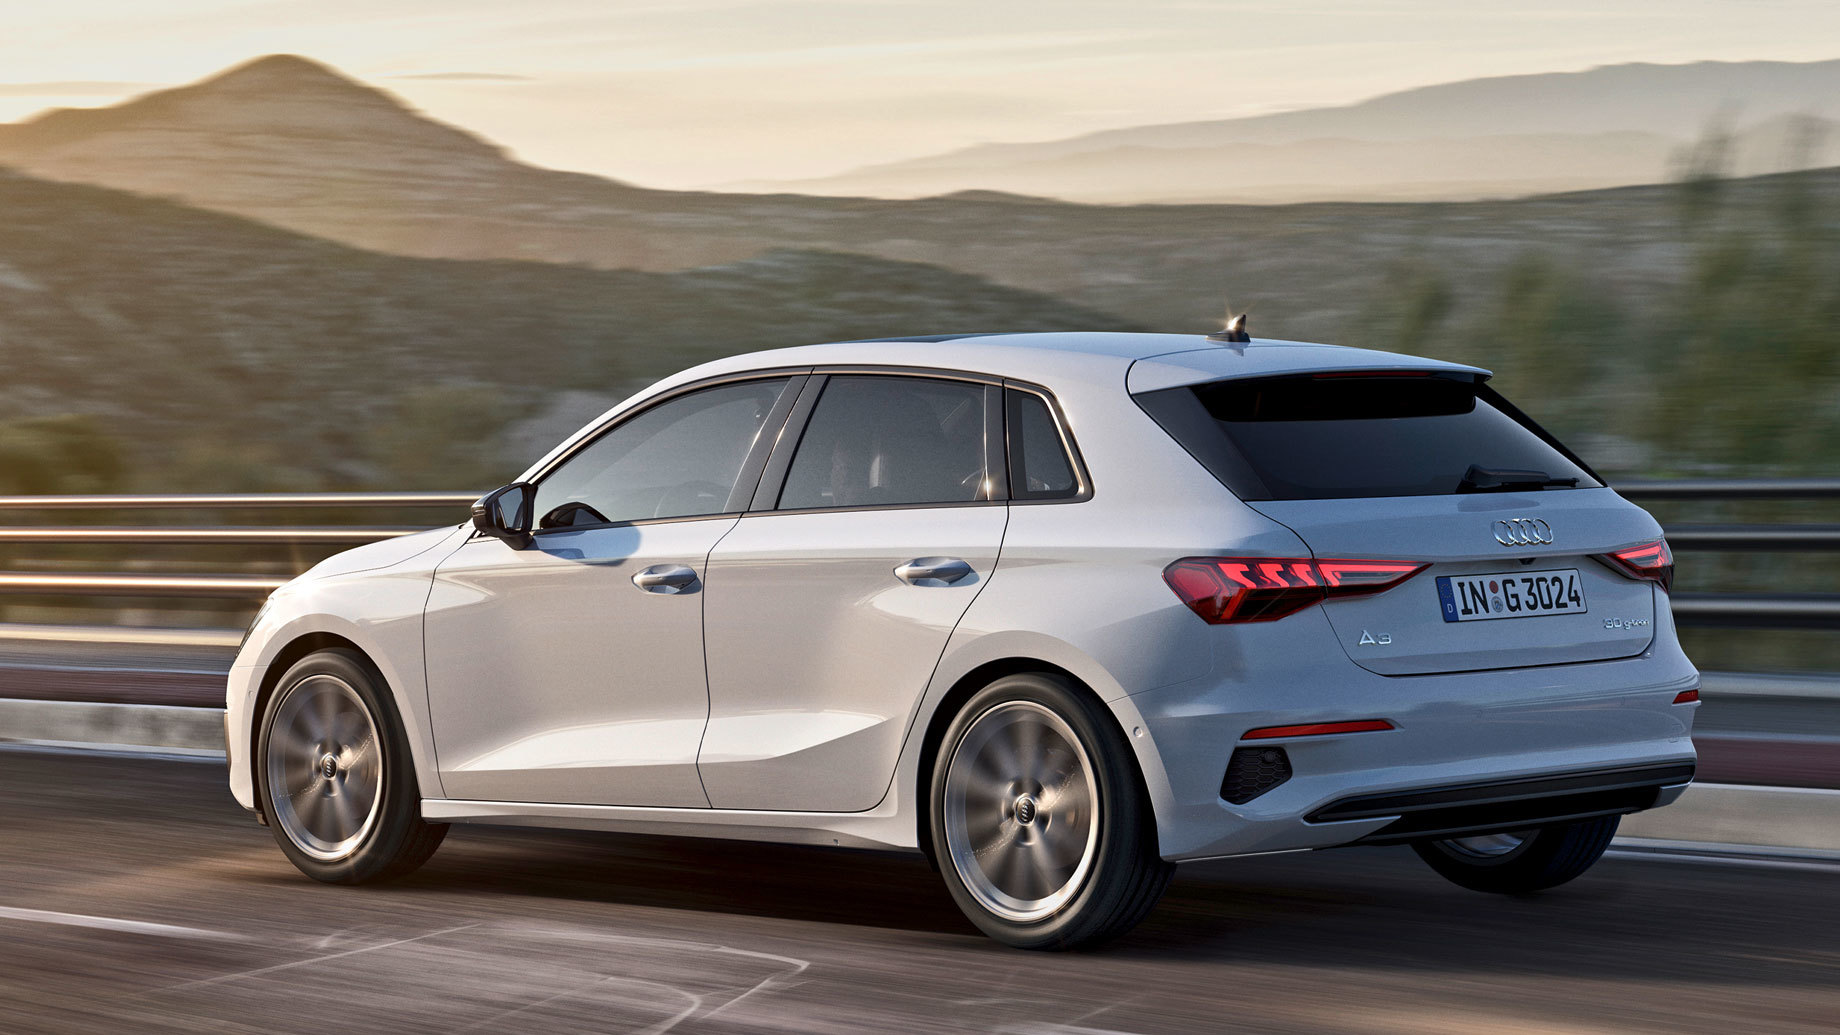 Audi A3 Sportback g-tron вернулся срядом улучшений